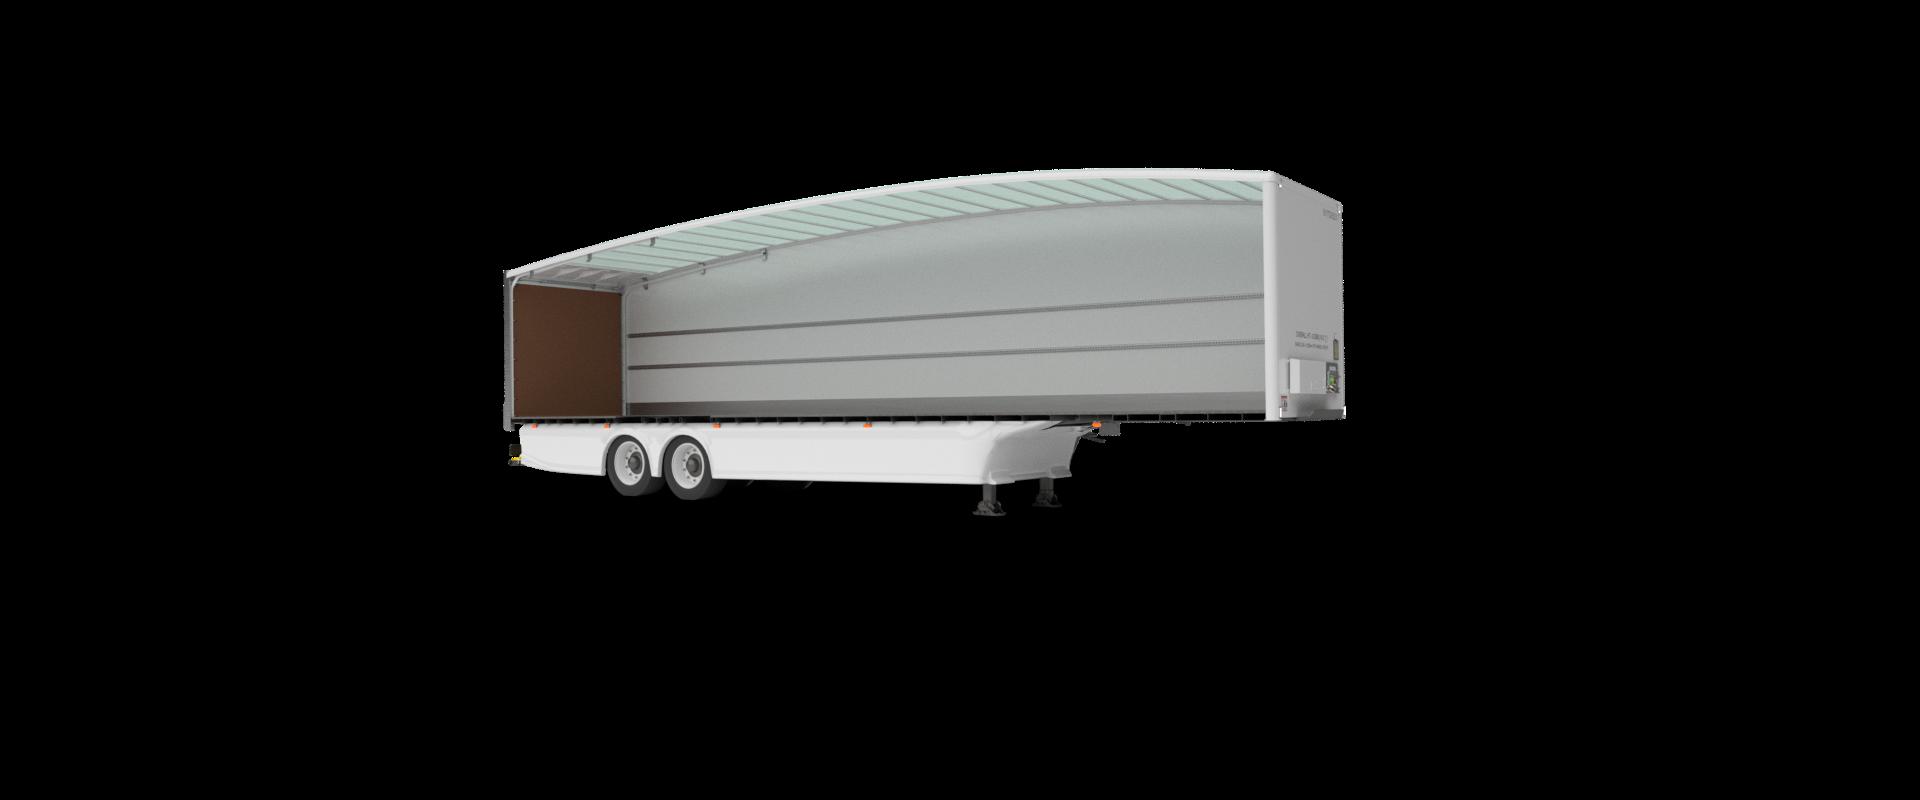 Aerodynamic Box Van Teardrop Trailer Closed